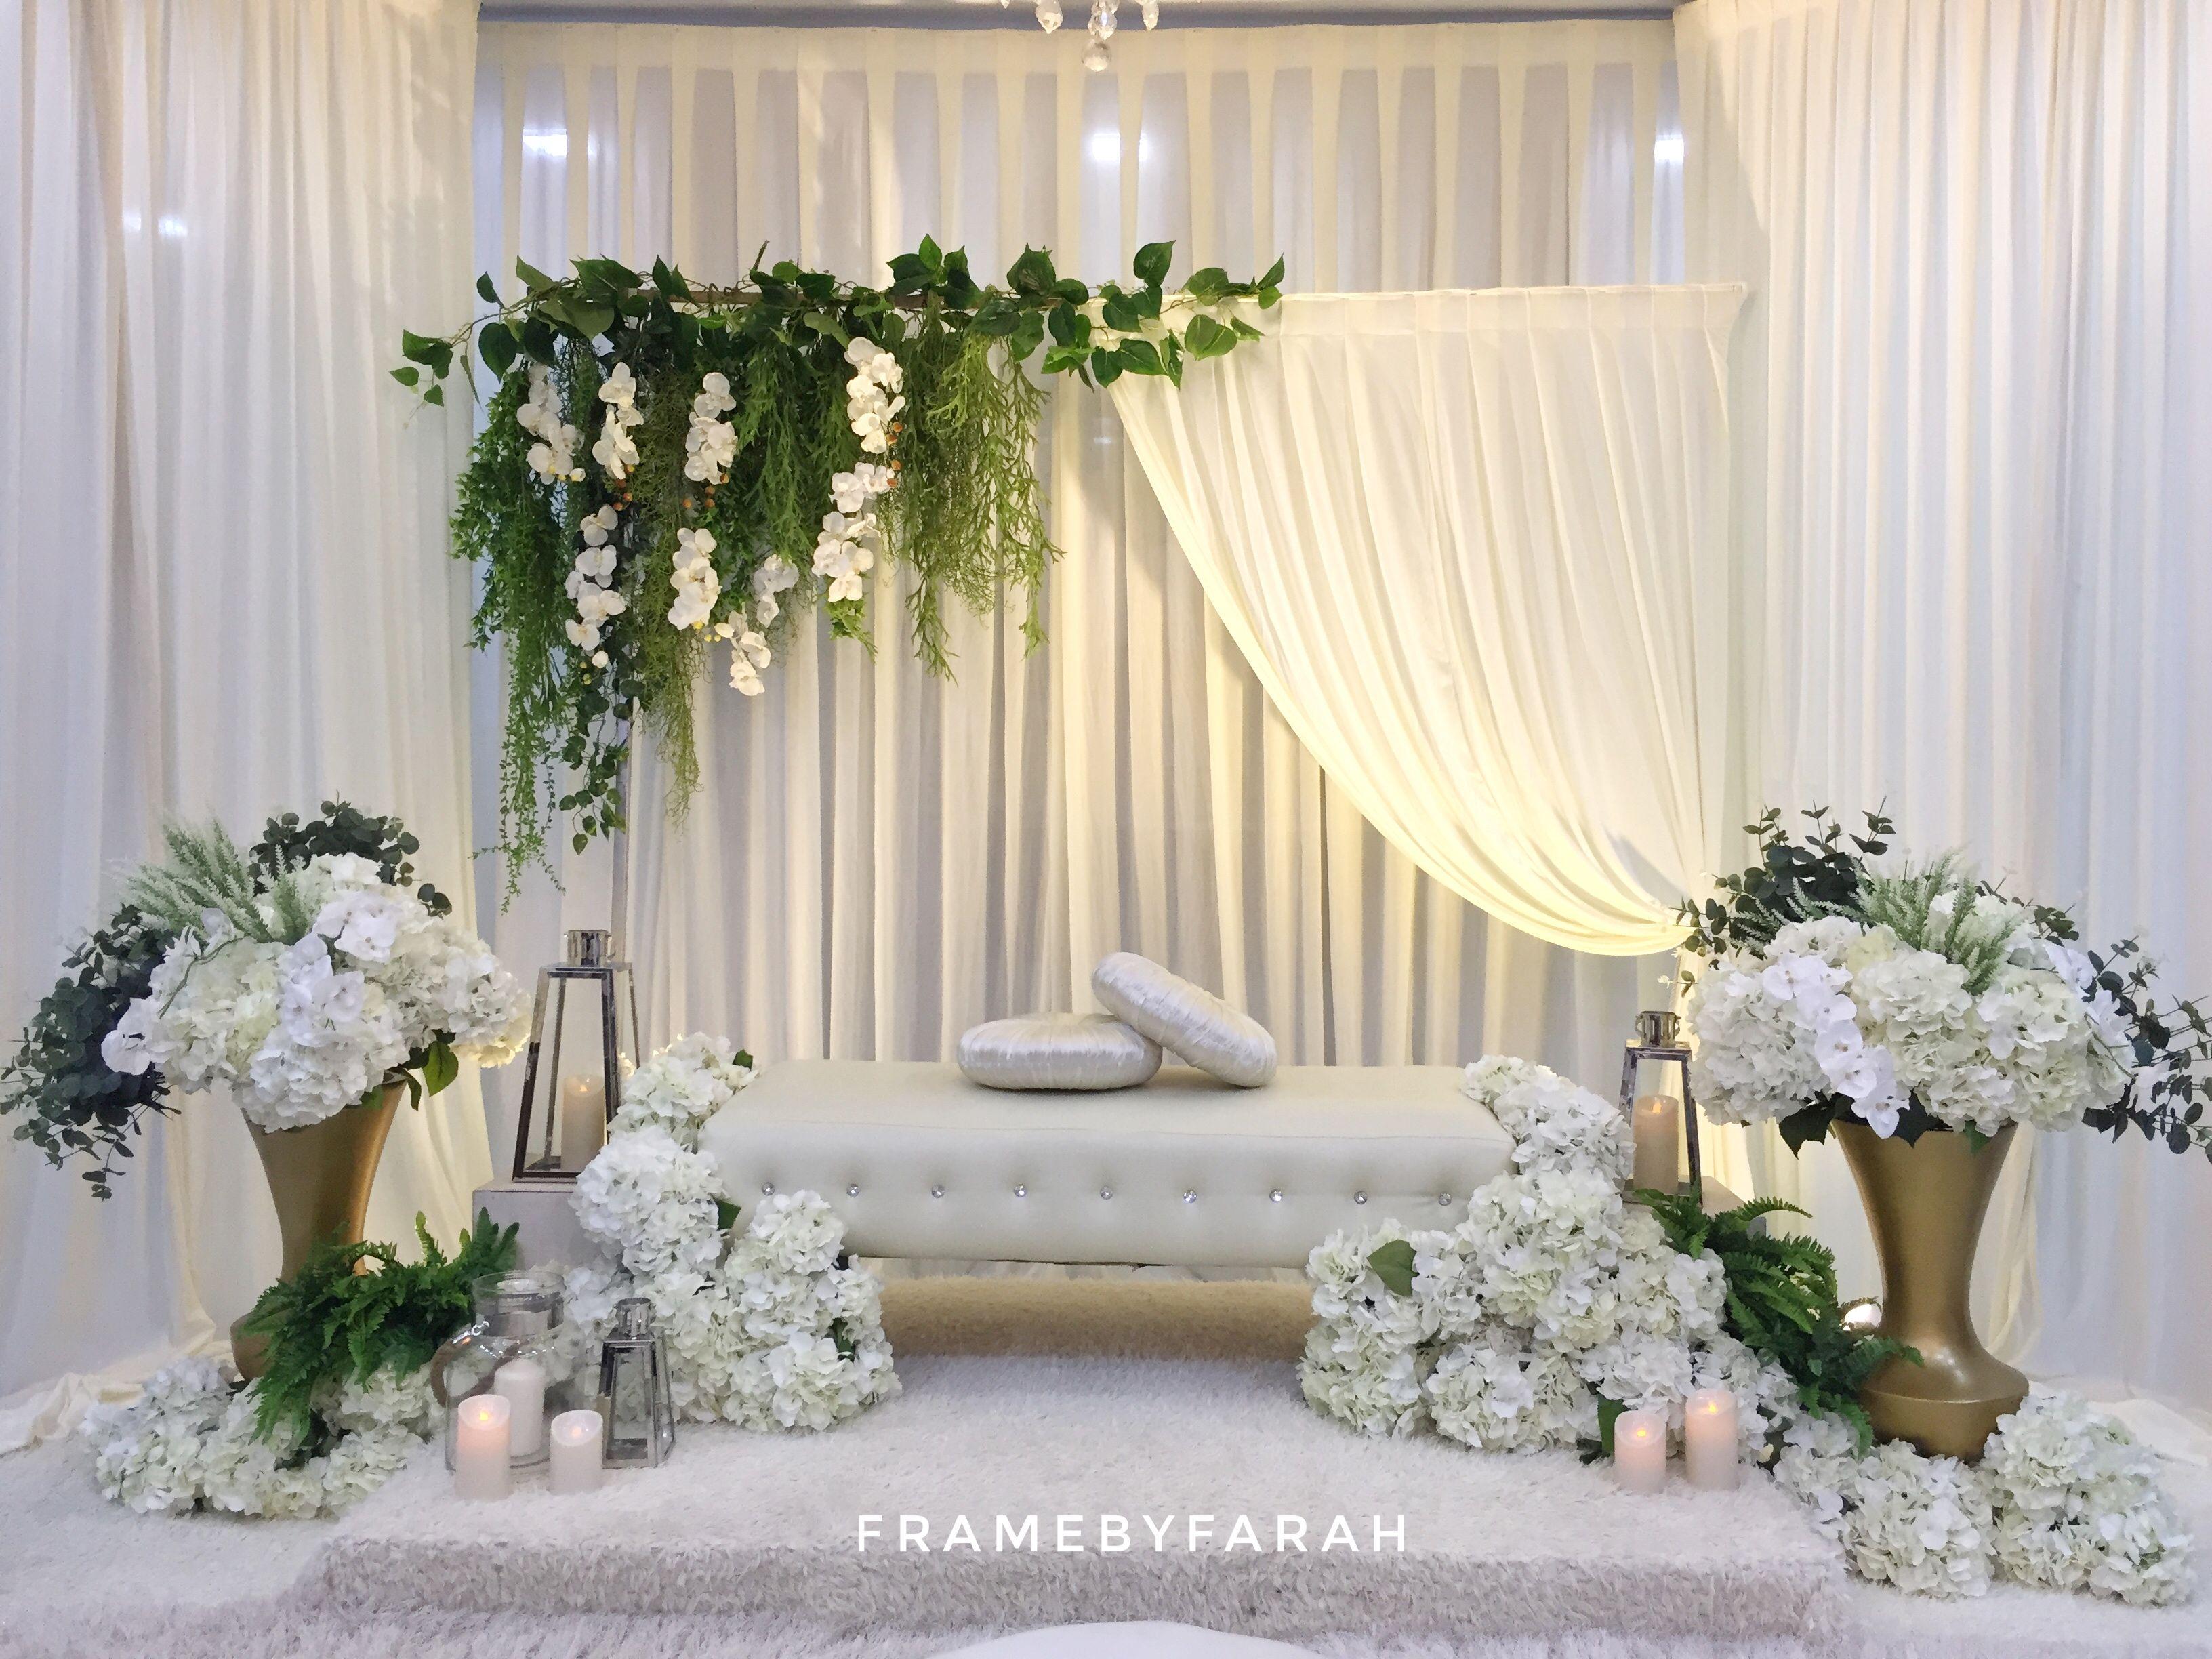 Mini Pelamin By Framebyfarah Latar Belakang Pernikahan Dekorasi Pernikahan Dekor